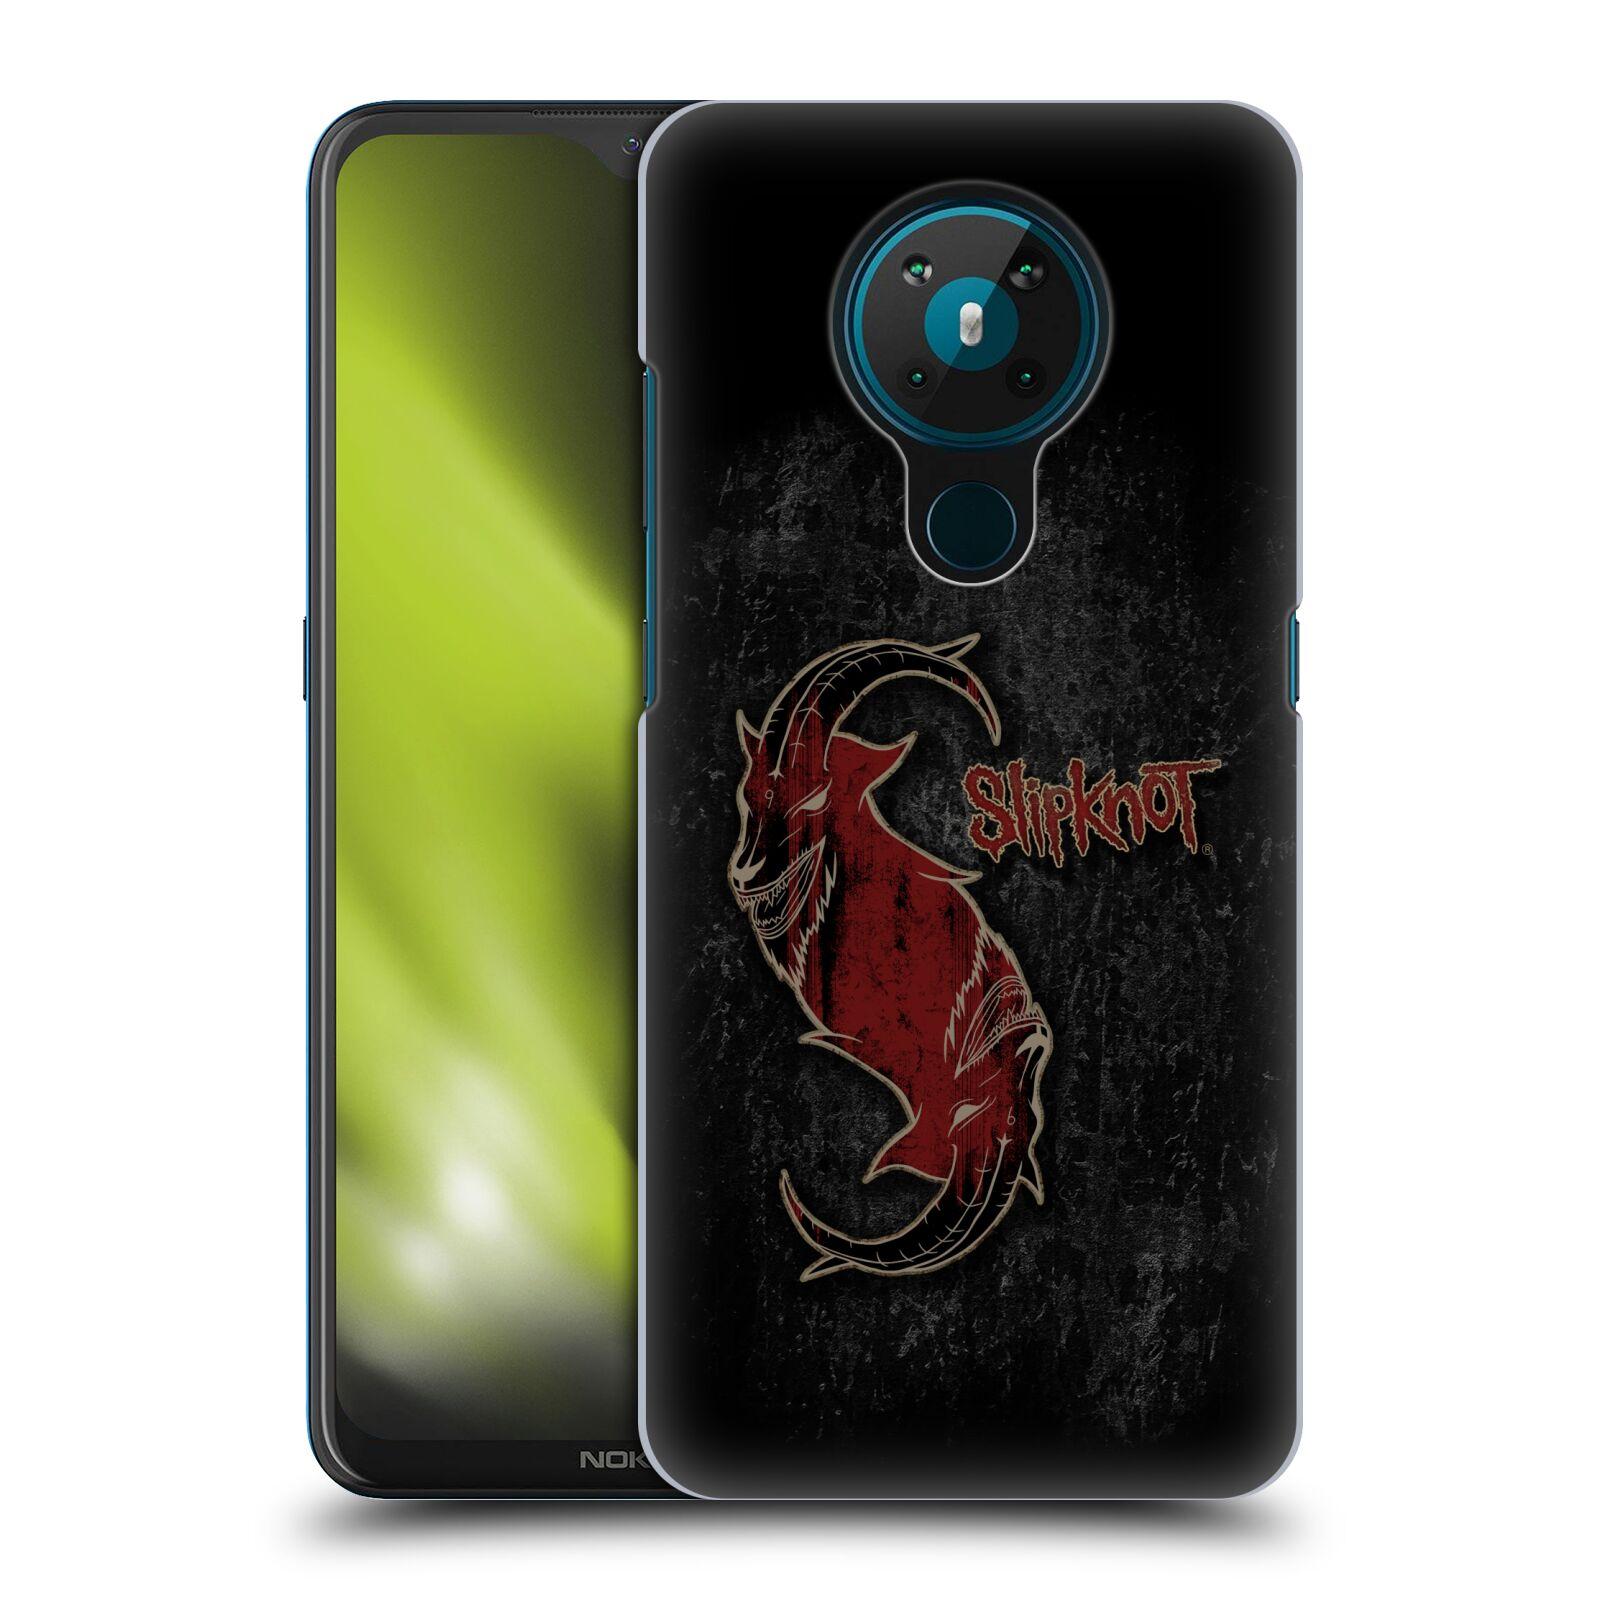 Plastové pouzdro na mobil Nokia 5.3 - Head Case - Slipknot - Rudý kozel